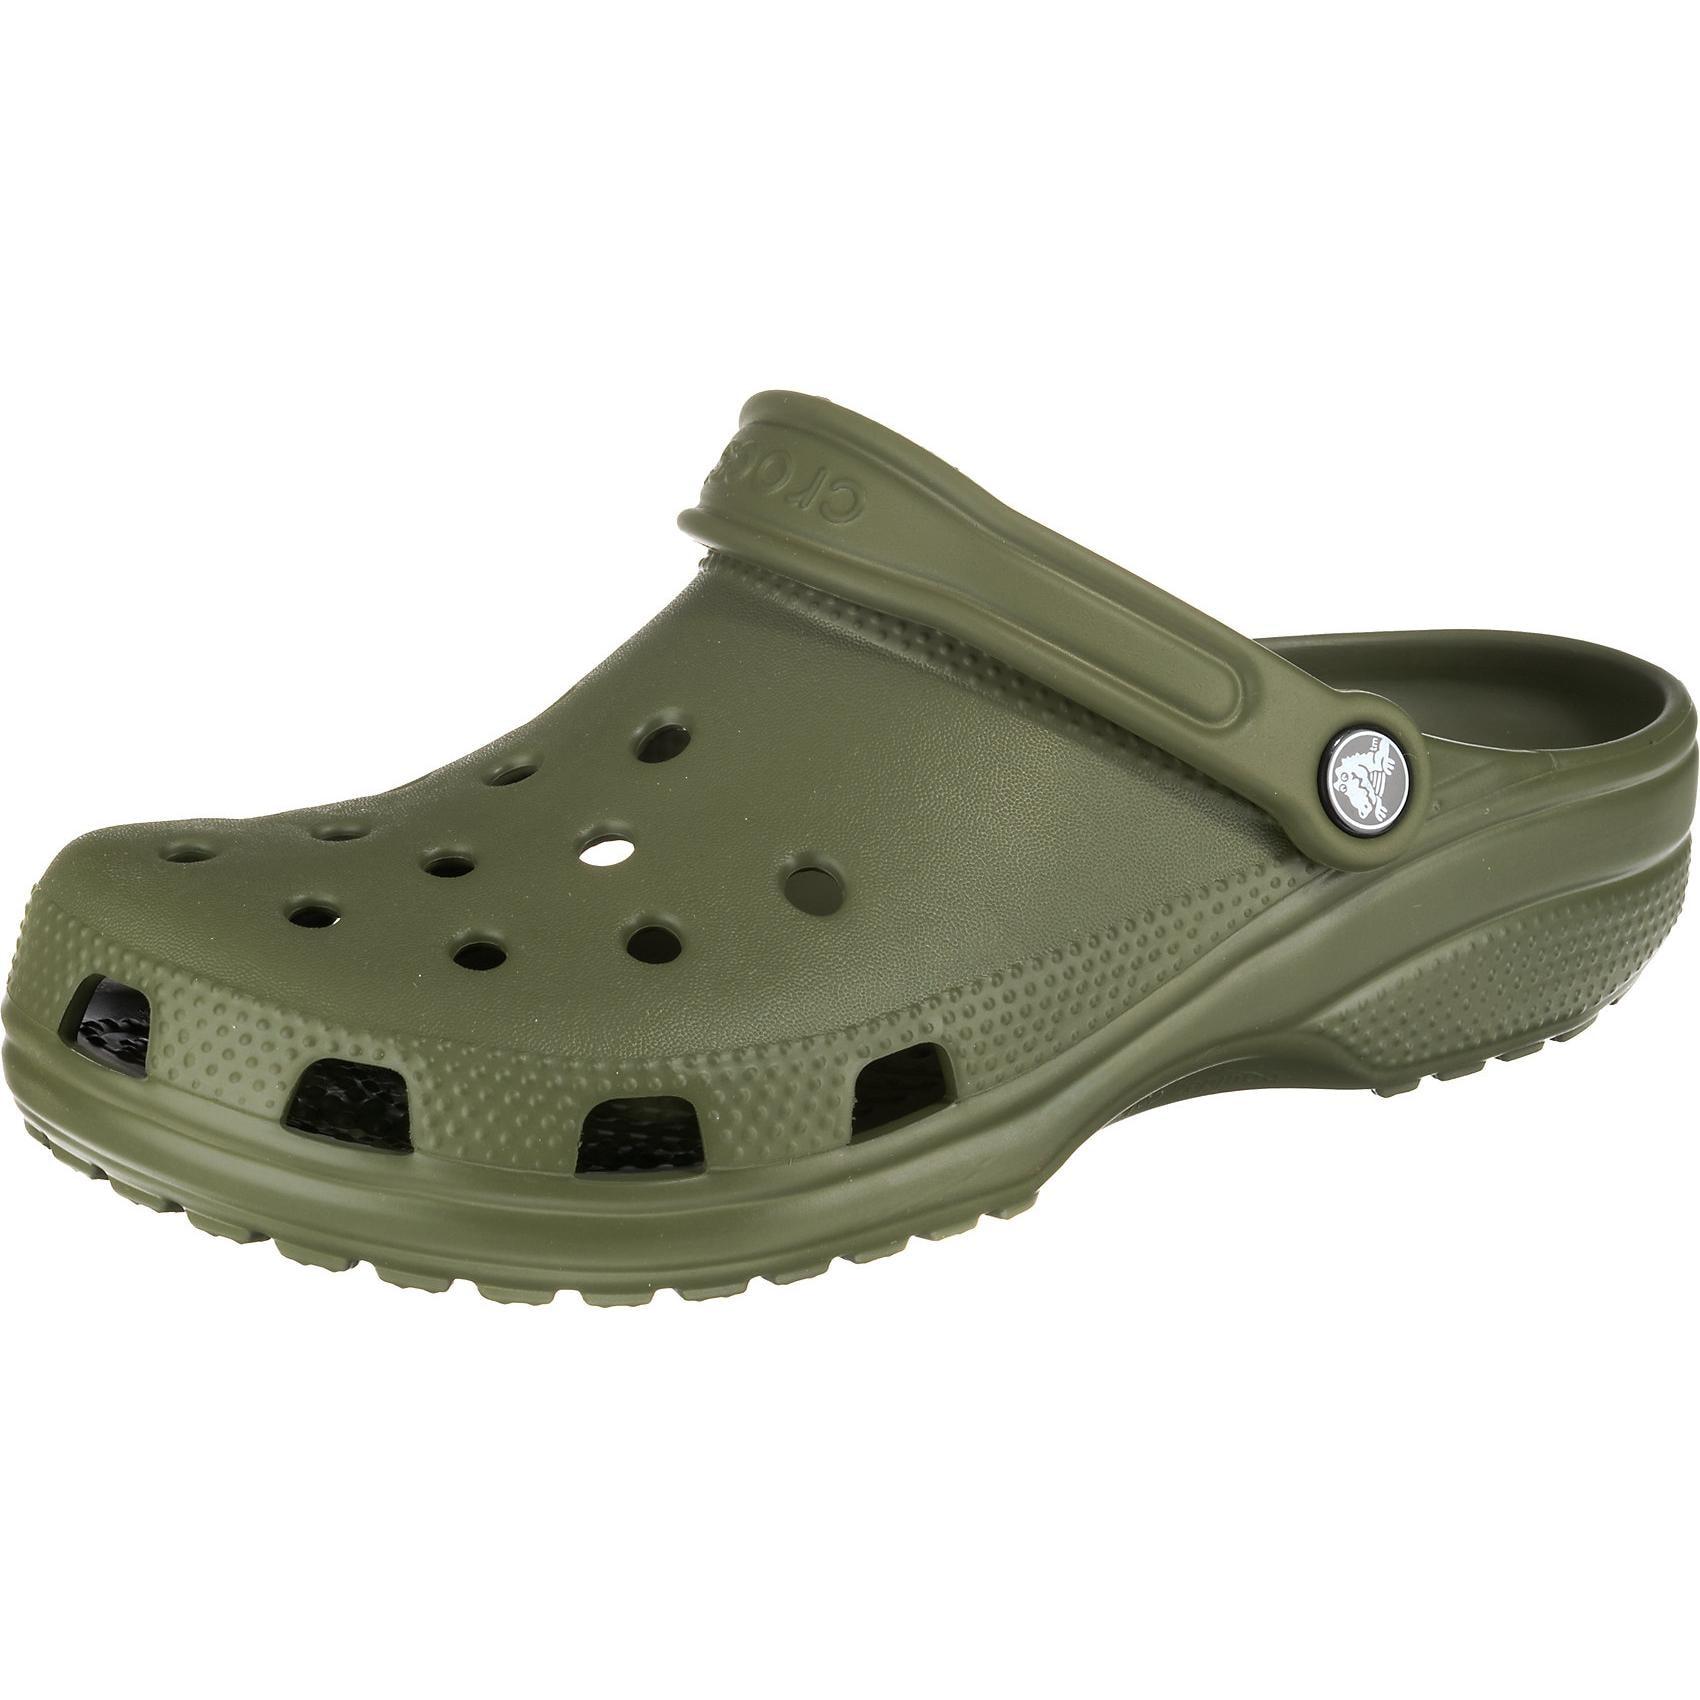 45b97898b21 Crocs online kaufen